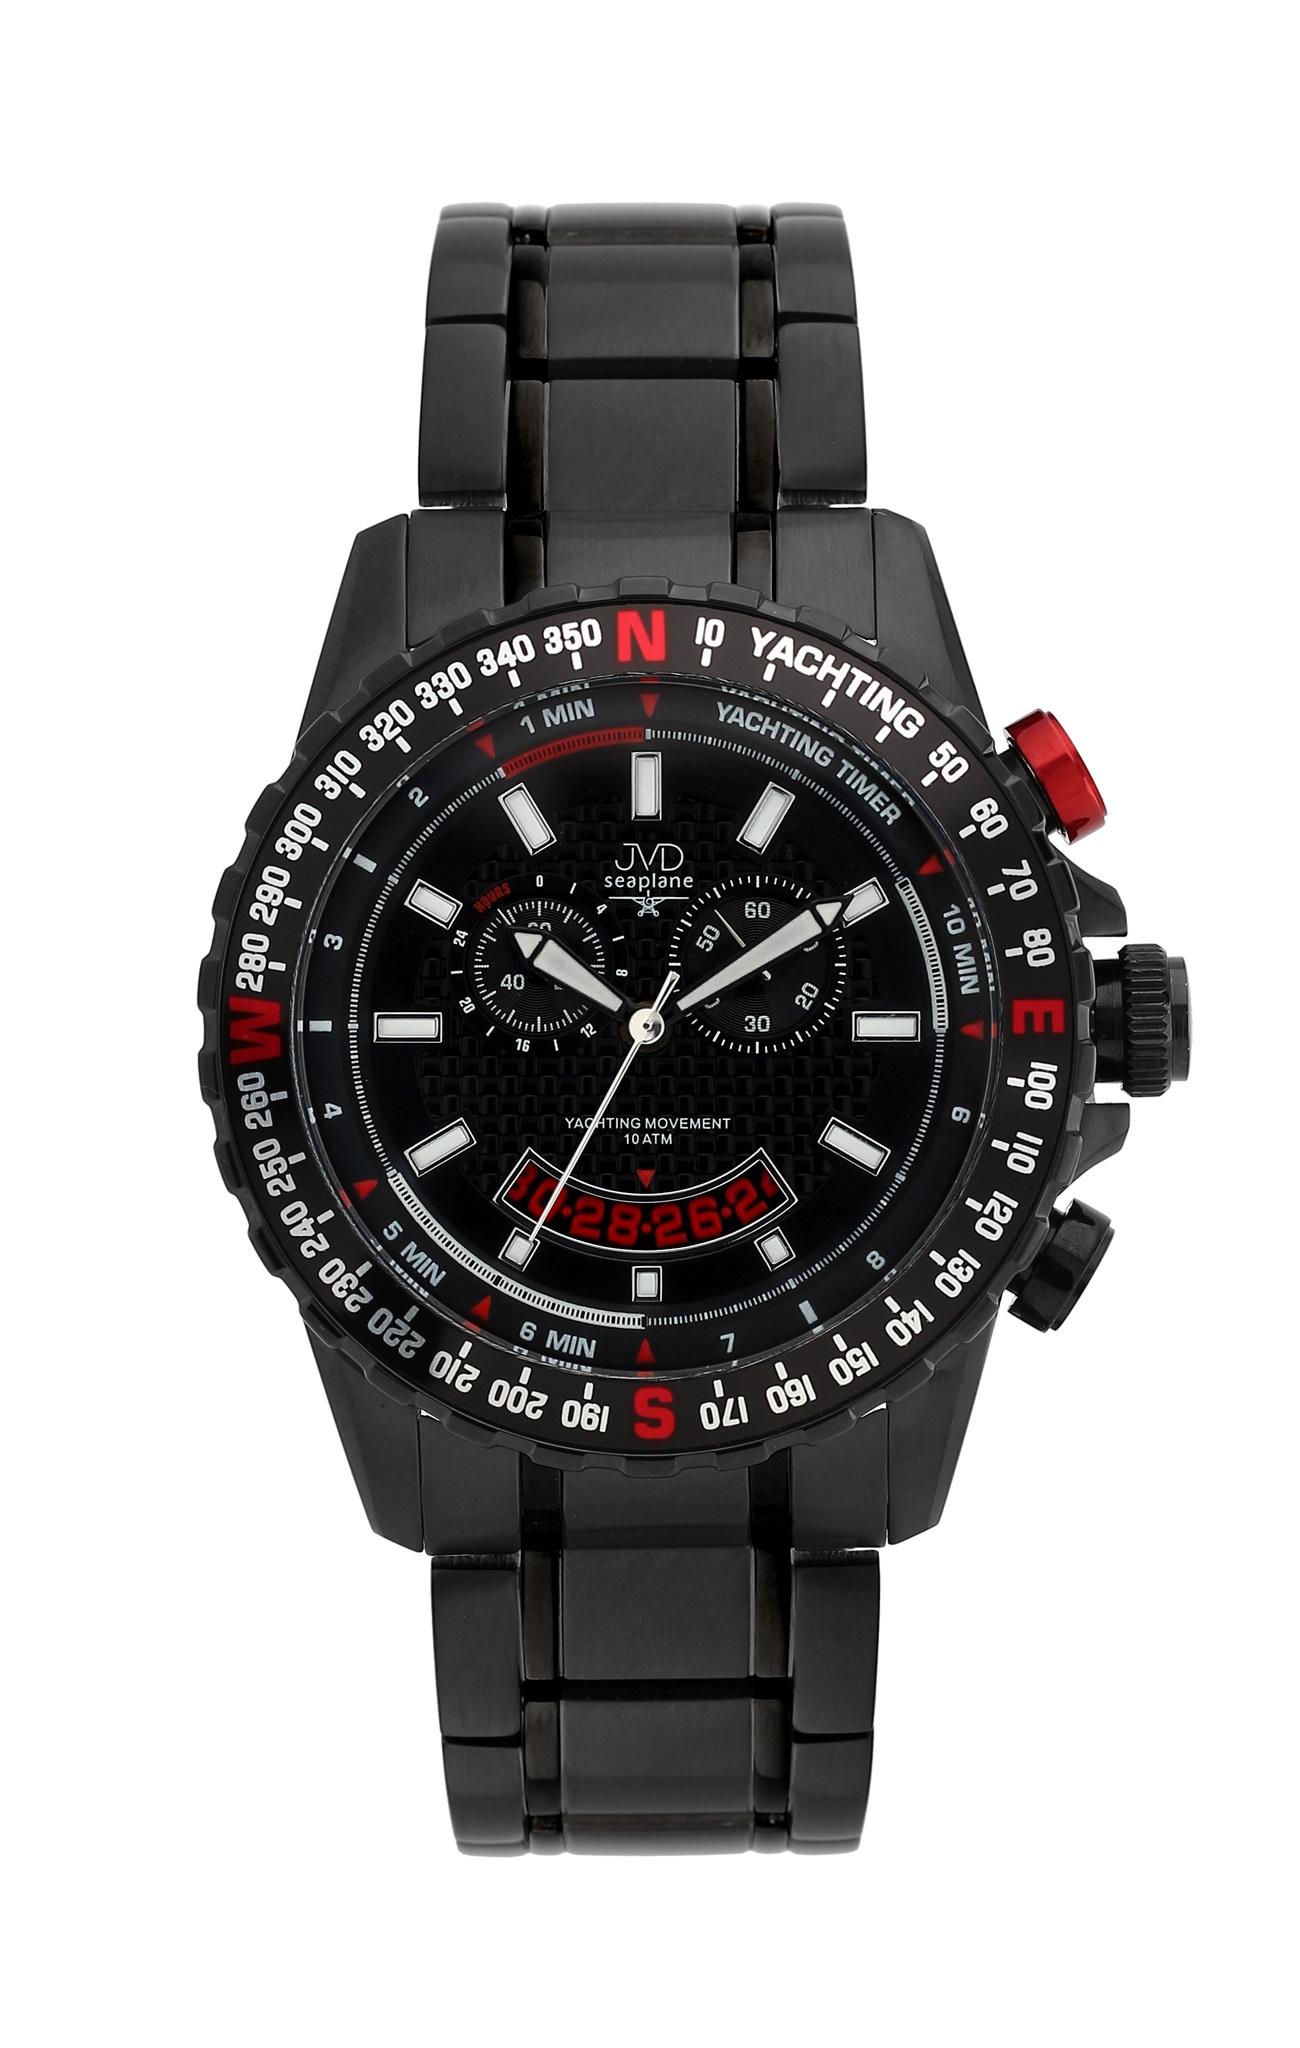 Černé vysoce odolné vodotěsné chronografy hodinky JVD seaplane J1096.3 10ATM POŠTOVNÉ ZDARMA! (POŠTOVNÉ ZDARMA!!)